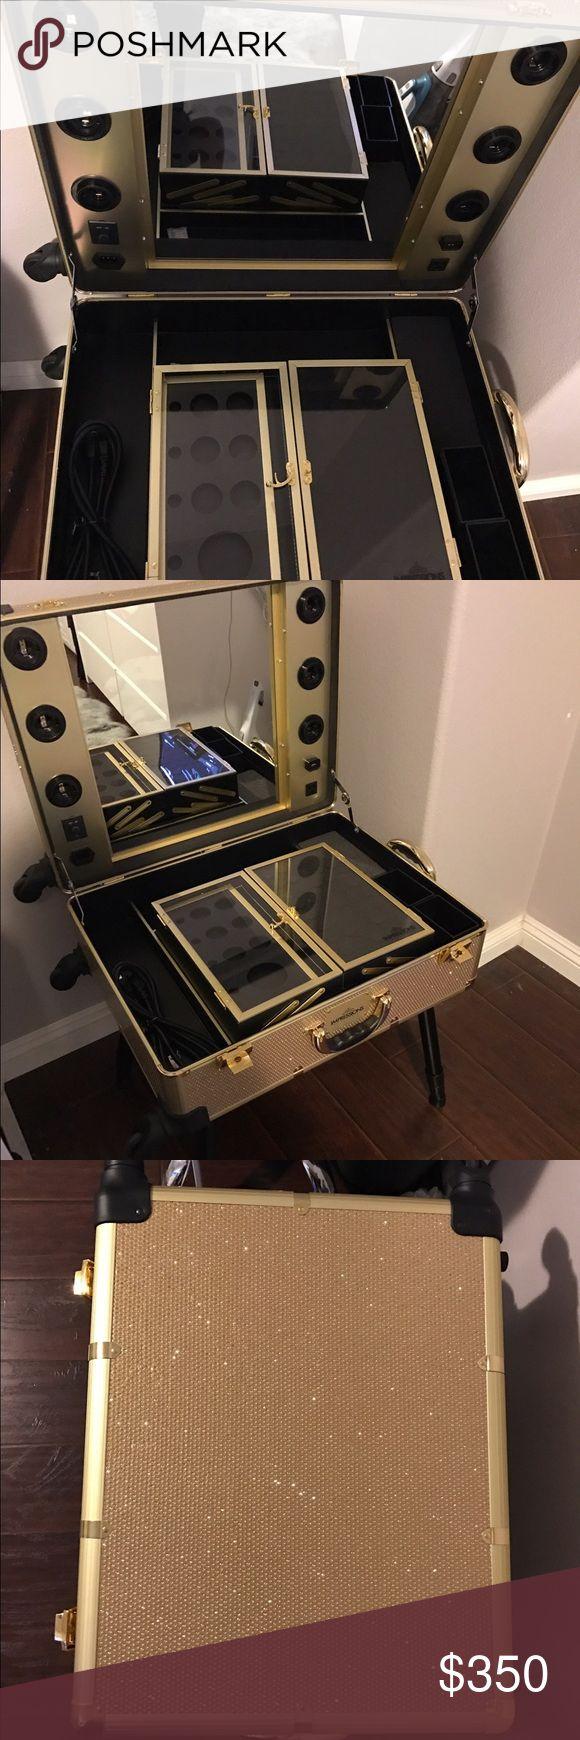 SLAYCASE PRO VANITY TRAVEL TRAIN CASE IN Goldbling Makeup suitcase by impression vanity new never used impression vanity Bags Travel Bags